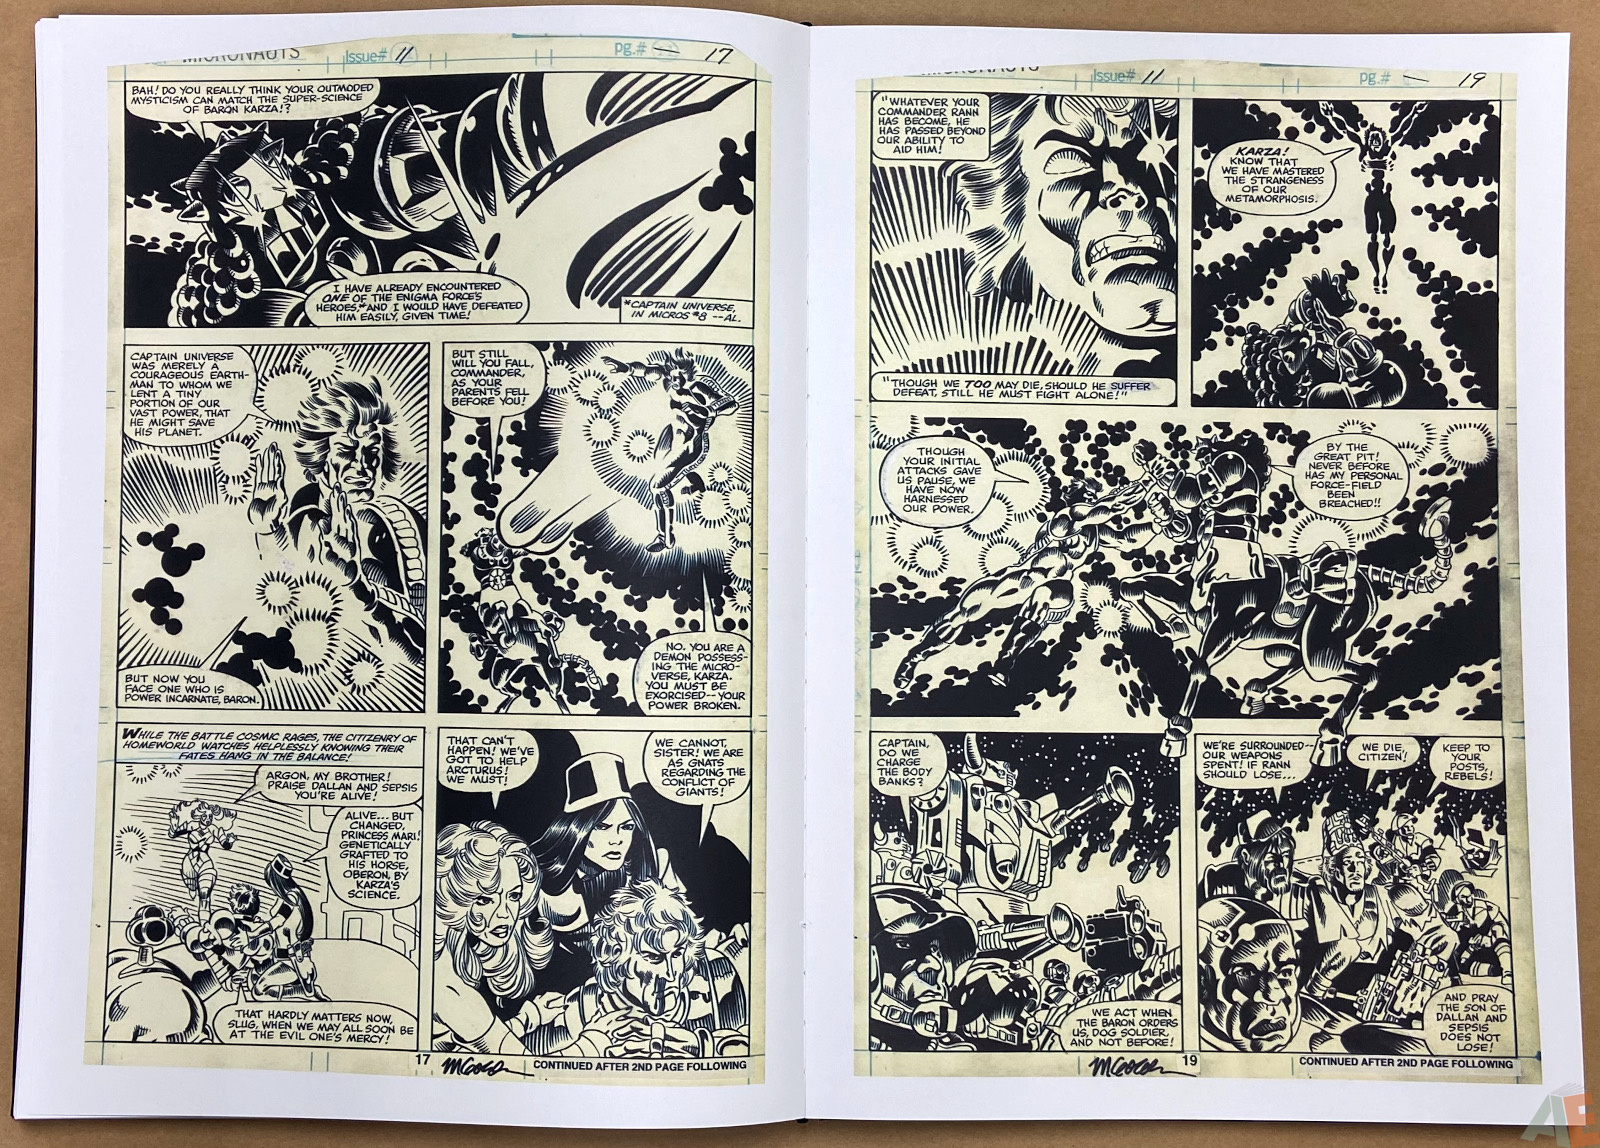 Michael Goldens Micronauts Artists Edition interior 11